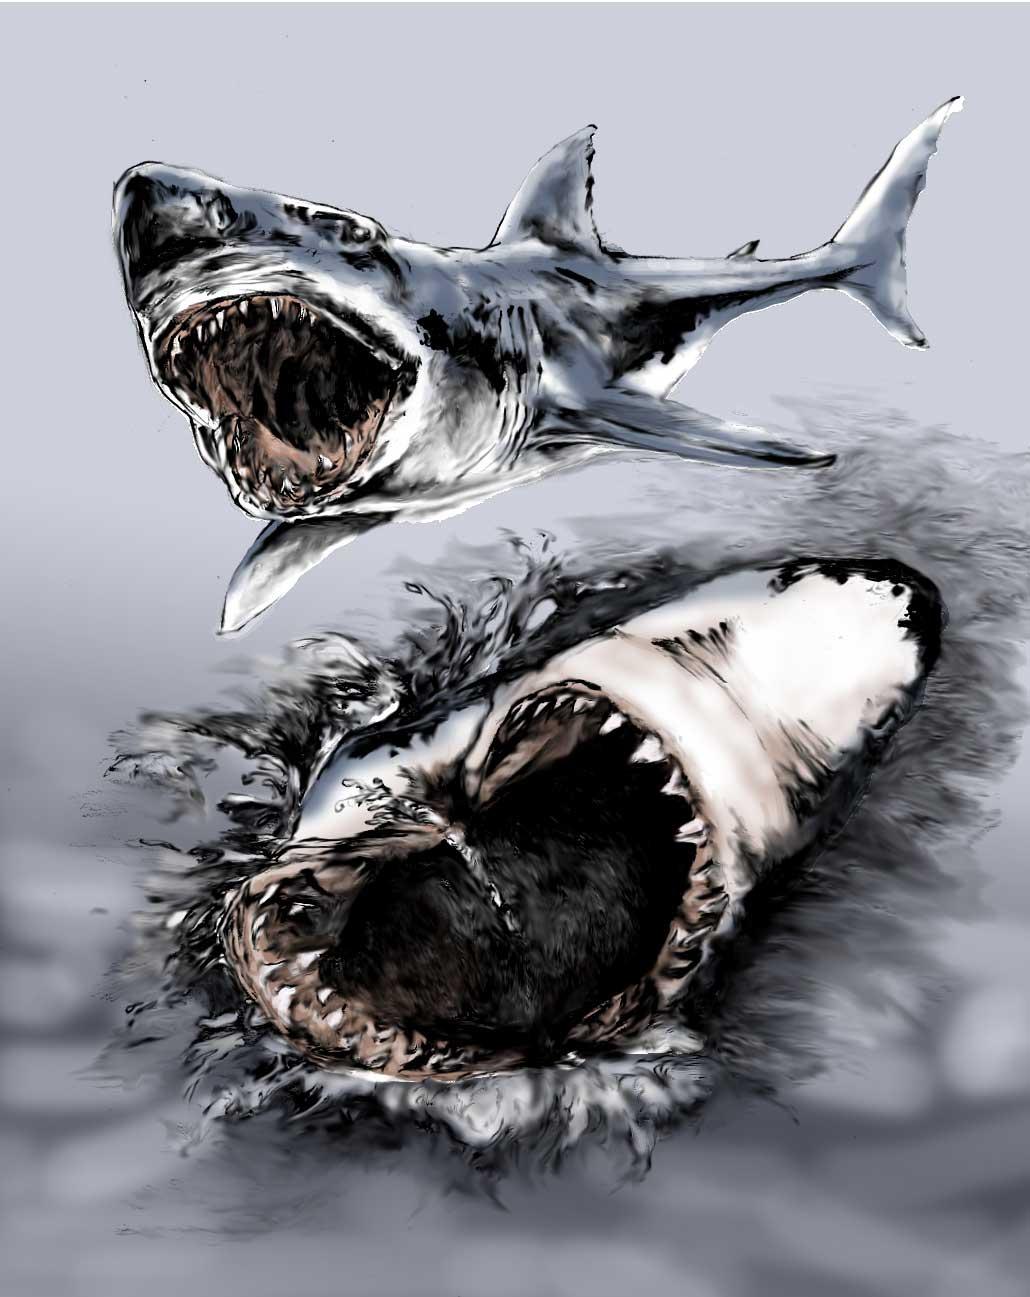 Drawn shark symbol Ideas: tattoo Tatoos design drawings